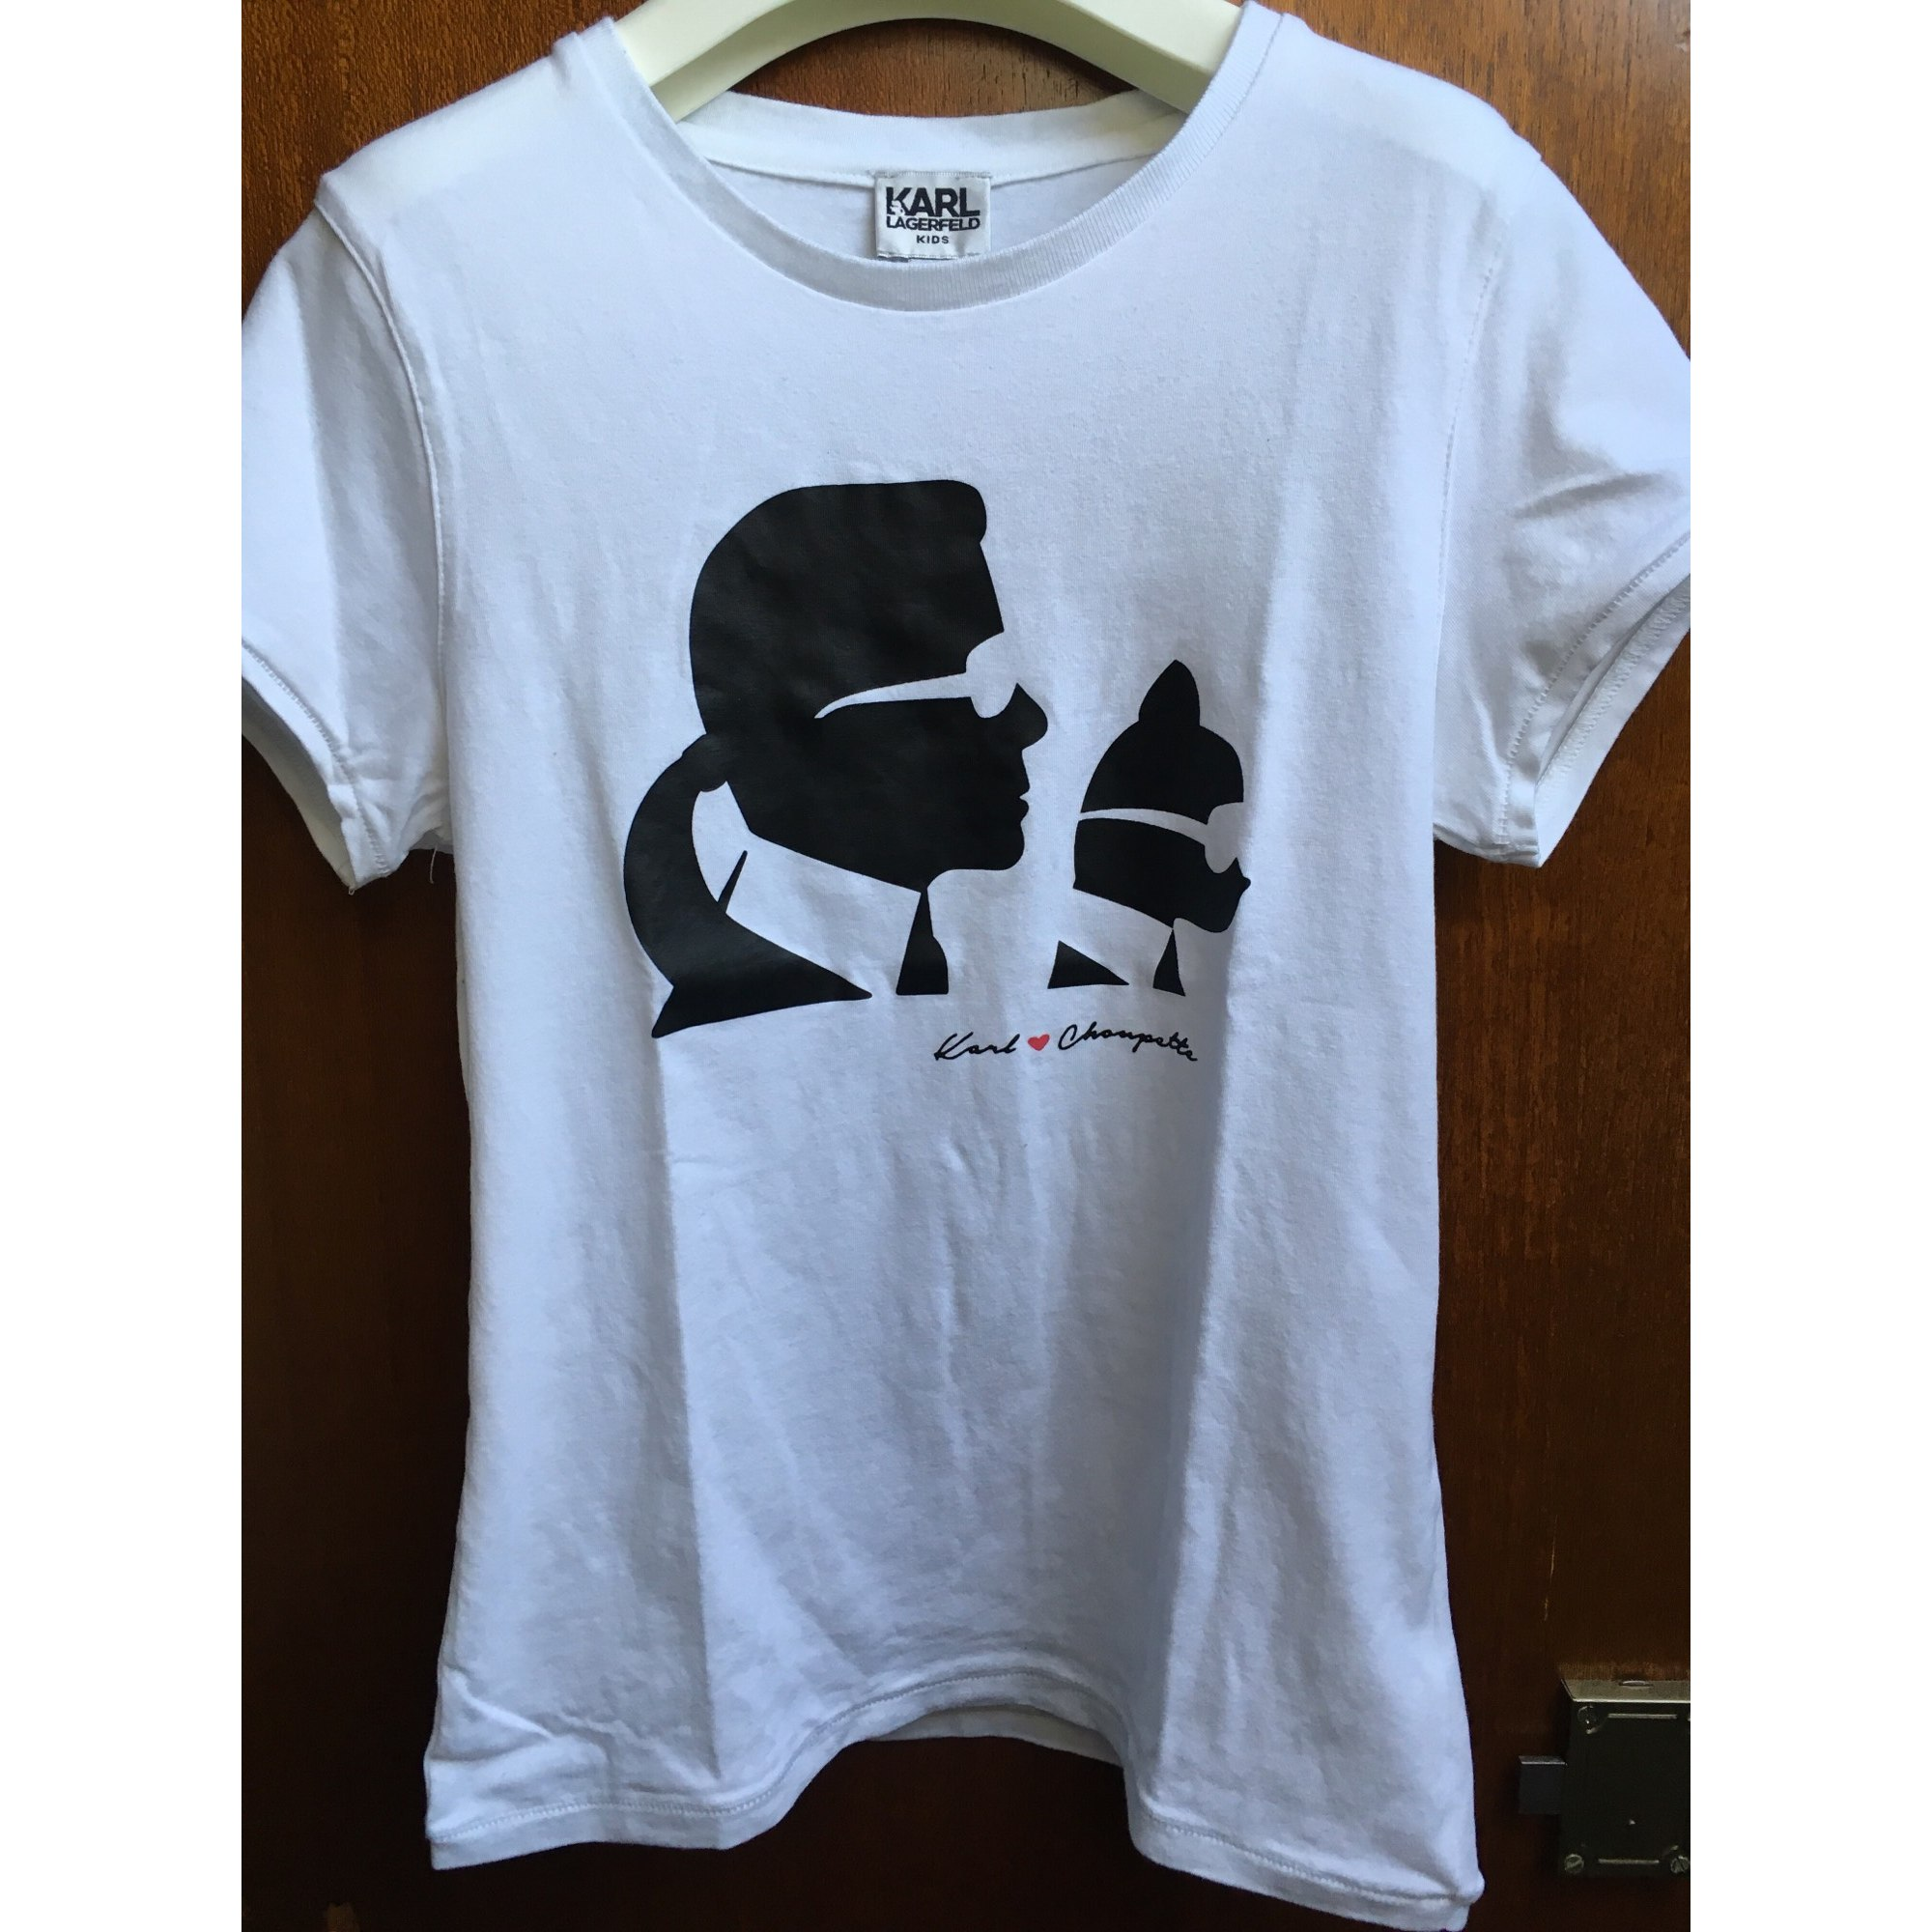 Top, Tee-shirt KARL LAGERFELD coton blanc 11-12 ans